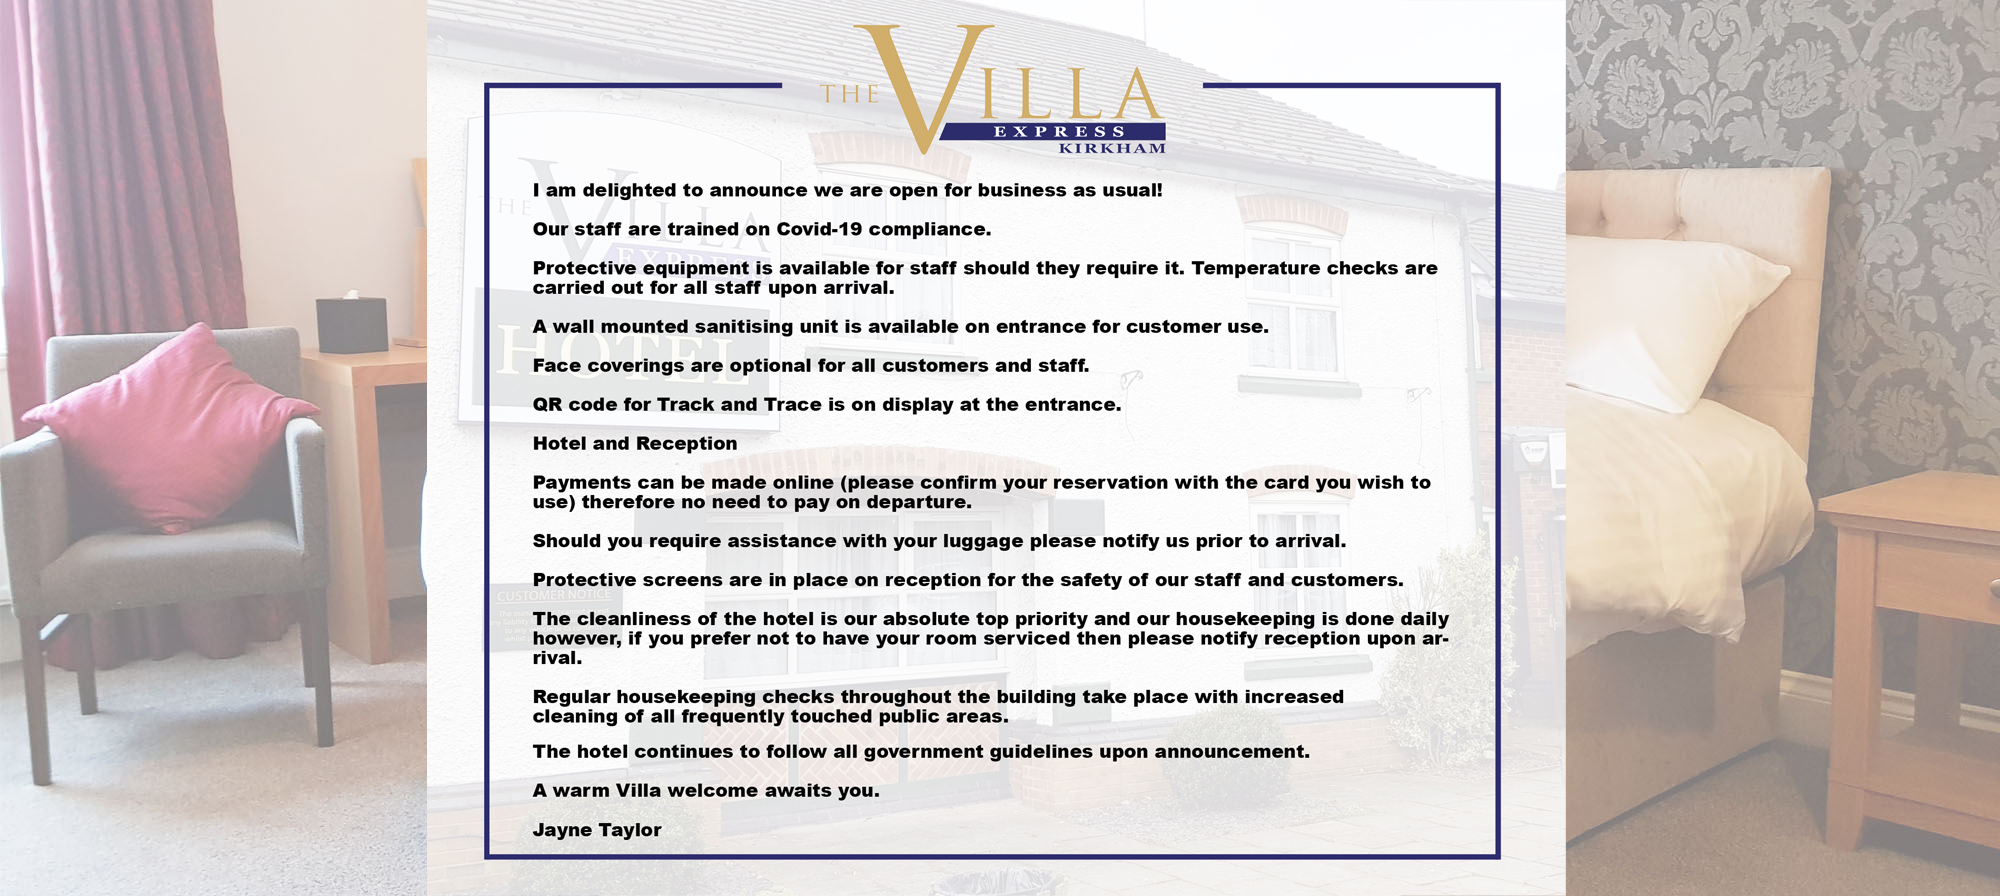 THE VIILLA EXPRESS – DV new